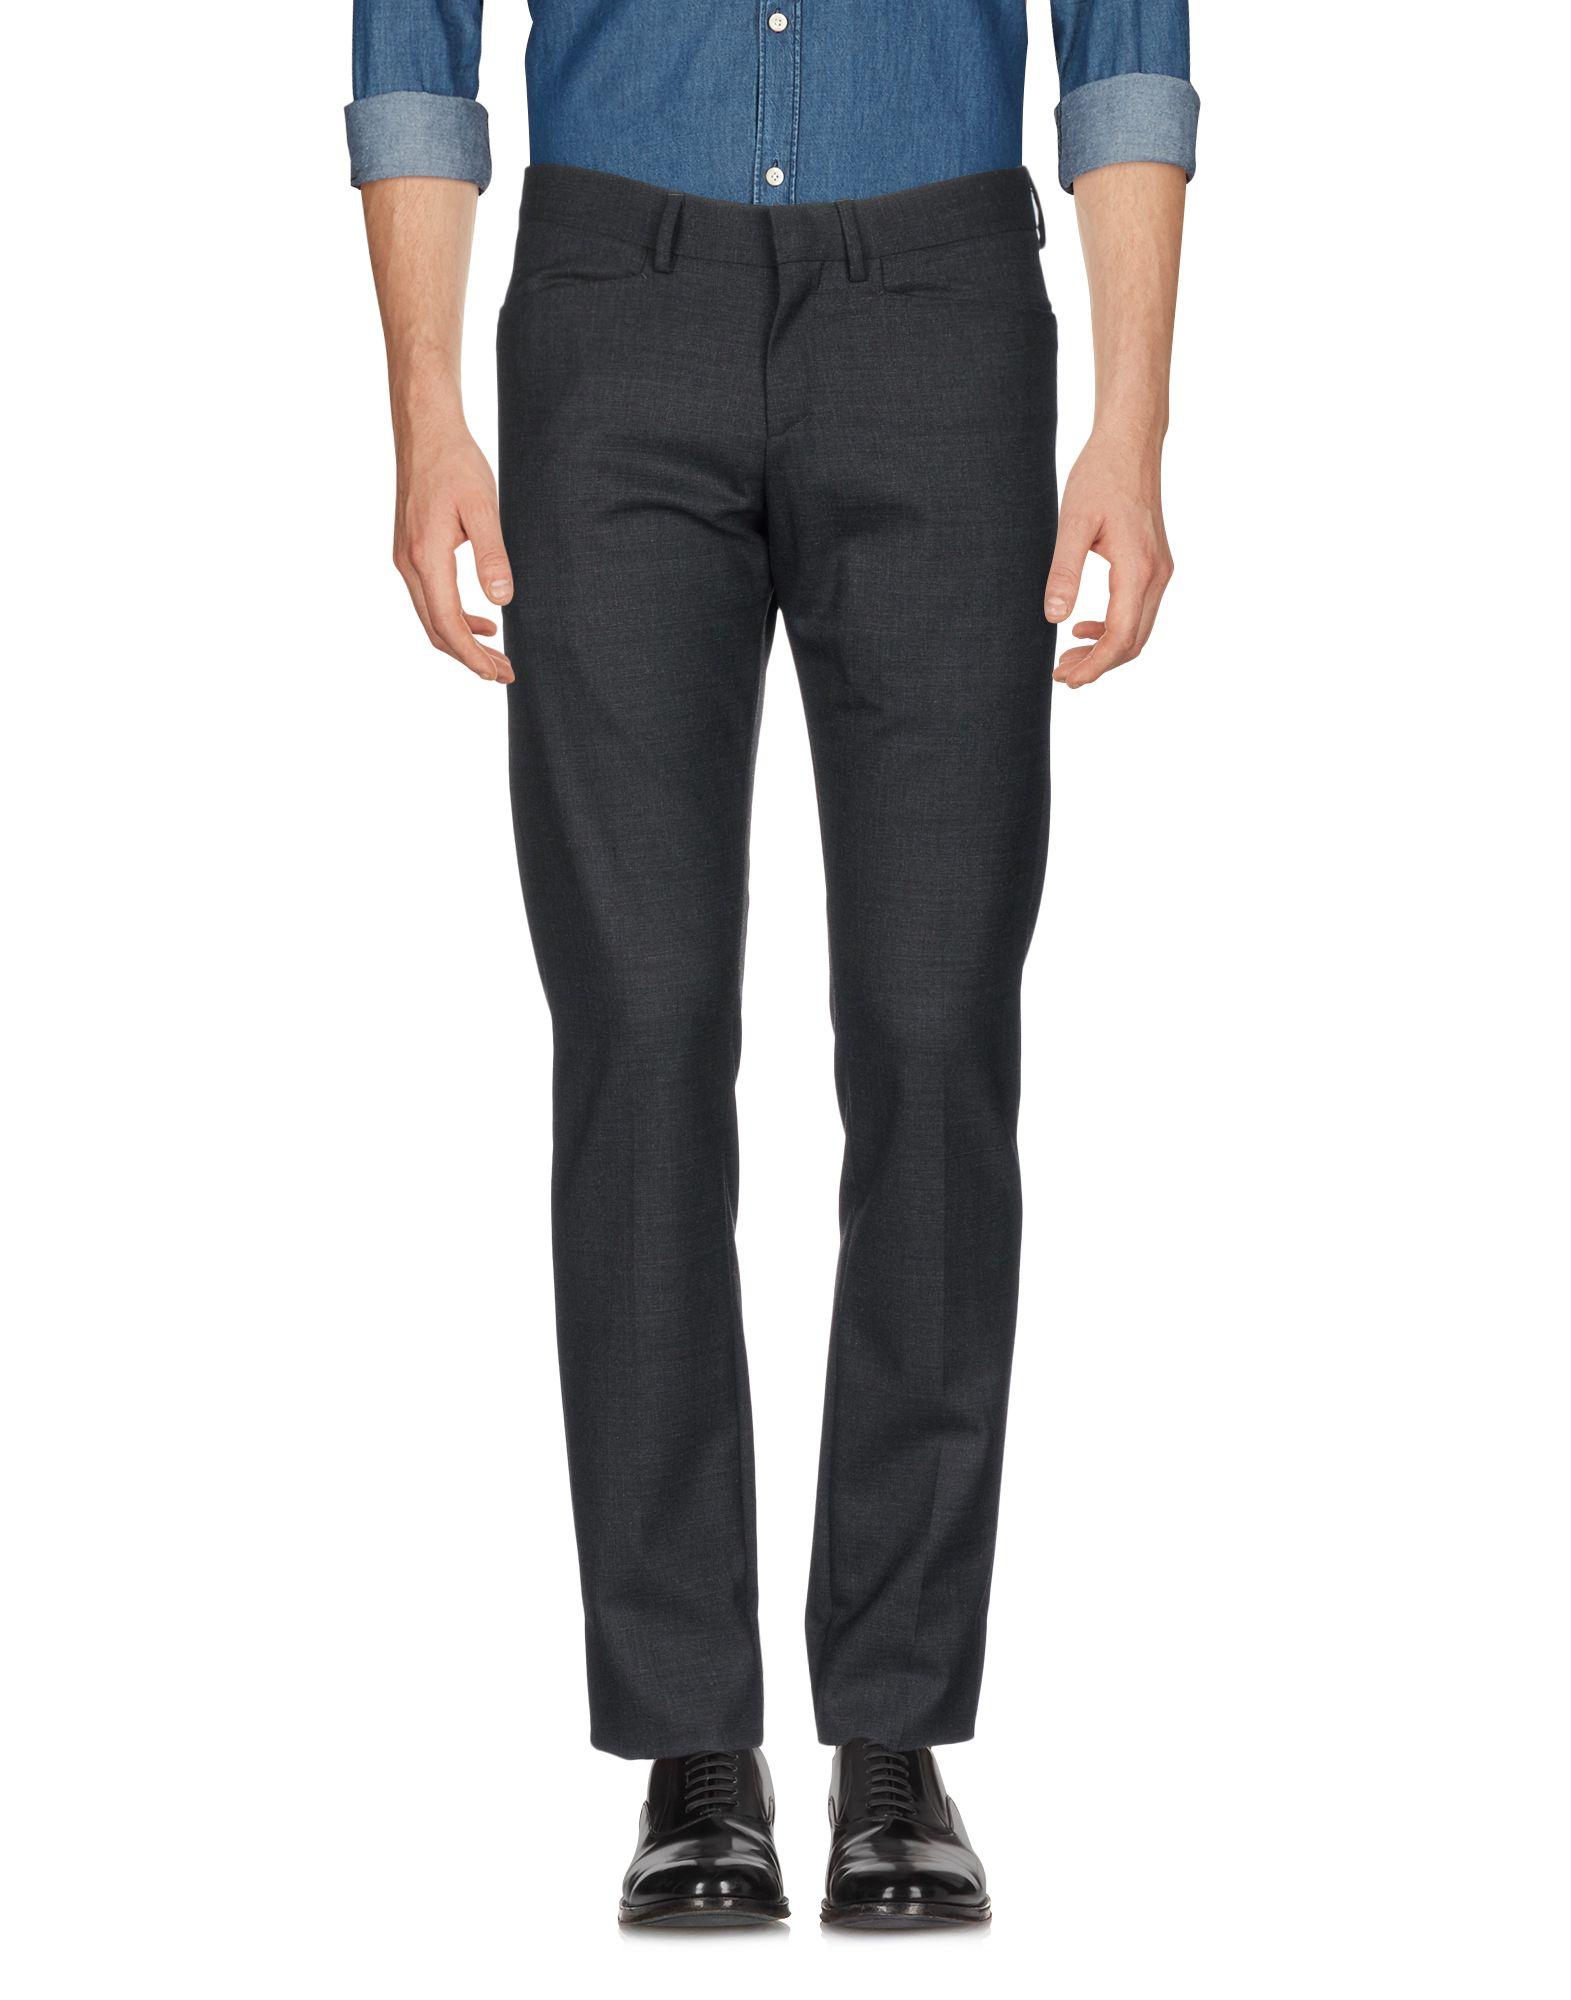 Pantalone Karl Lagerfeld Uomo - Acquista online su